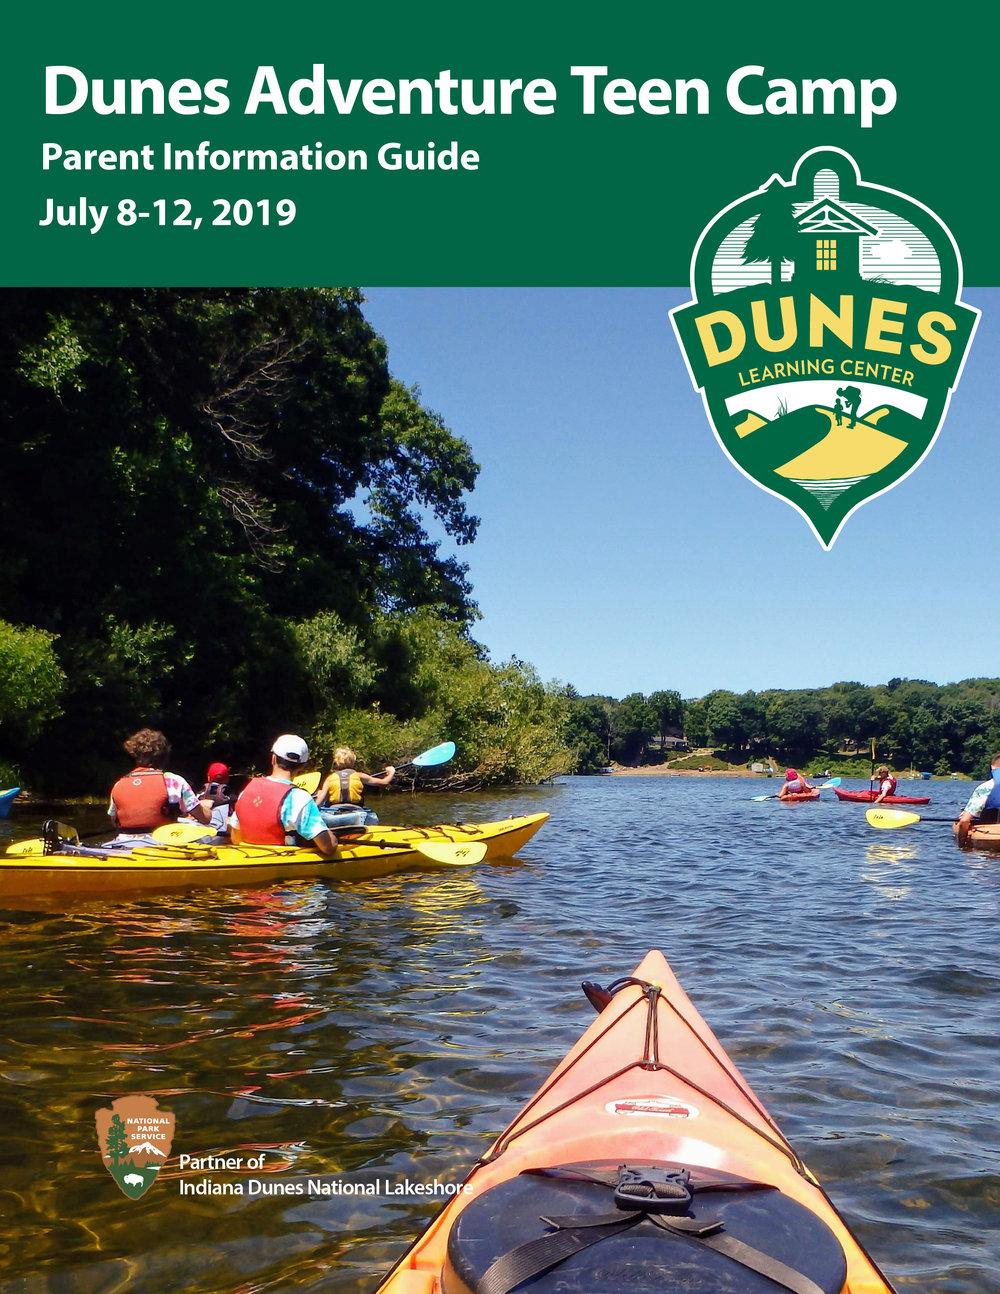 Dunes Adventure Teen Camp parent guide